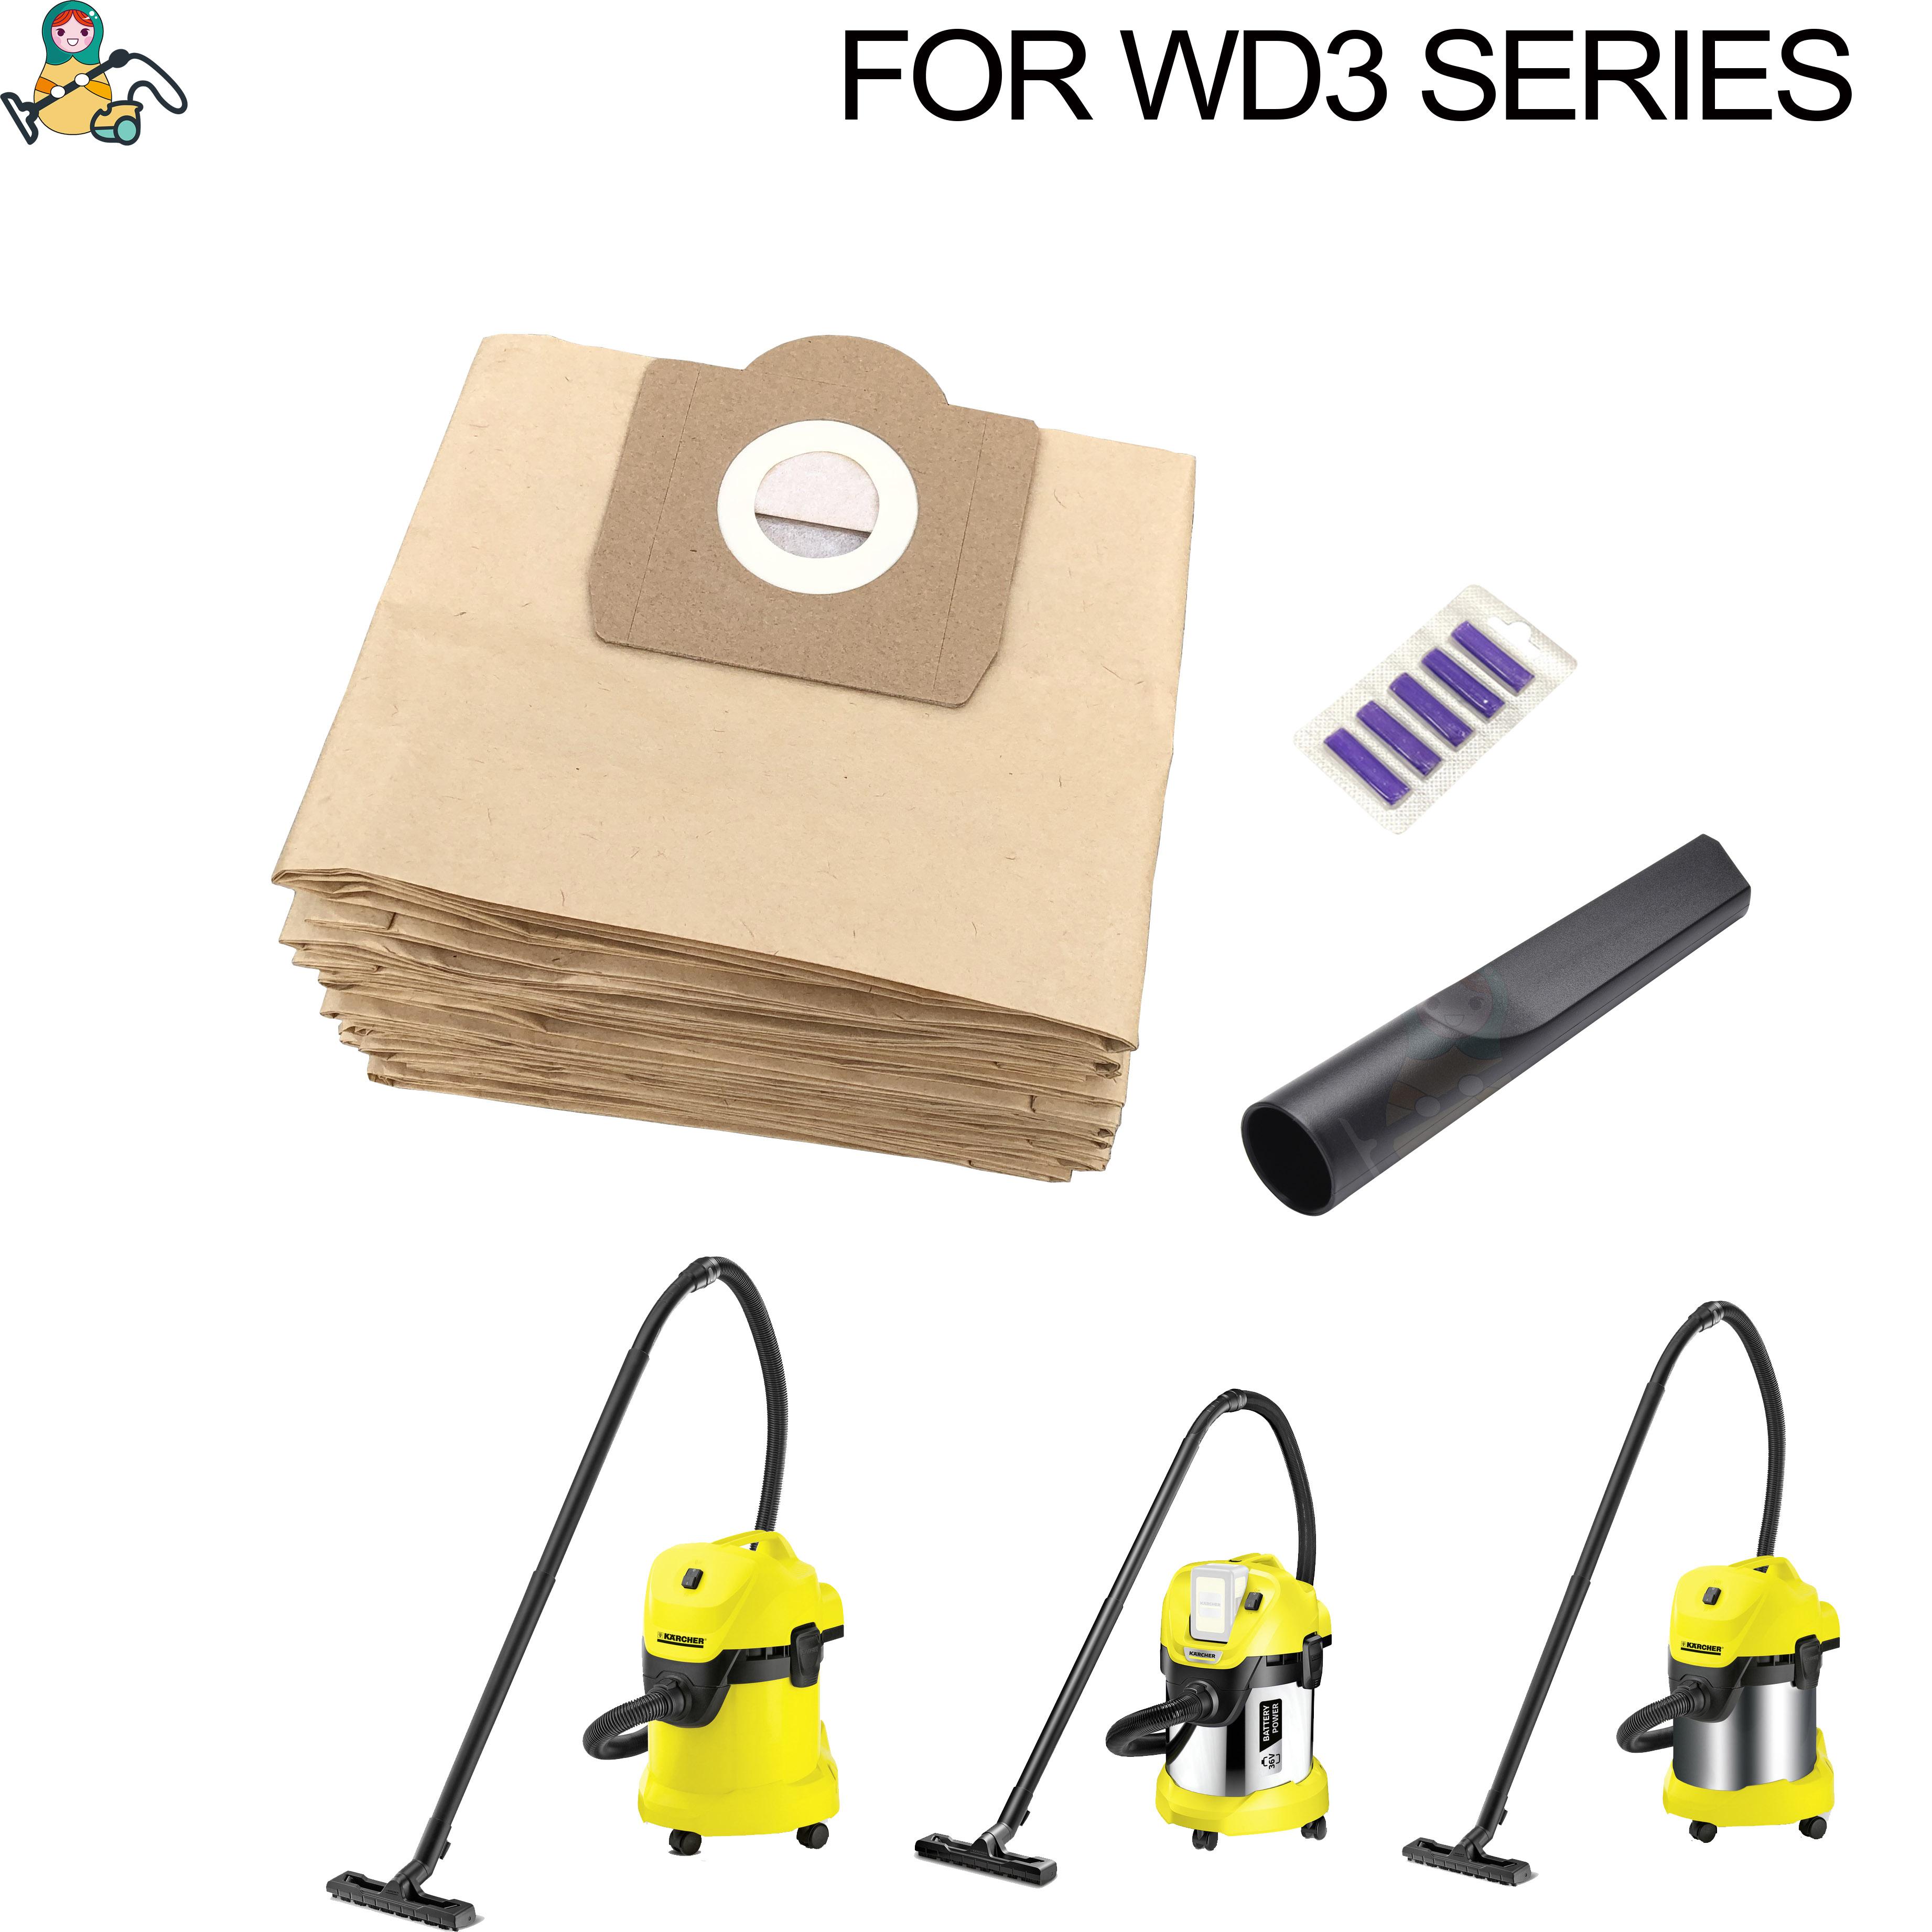 6.959-130 For Karcher WD3 Bags WD 3 P WD3.500P SE4001 SE4002 A2004 A2204  WD5.800 WD3.800 WD 3.200